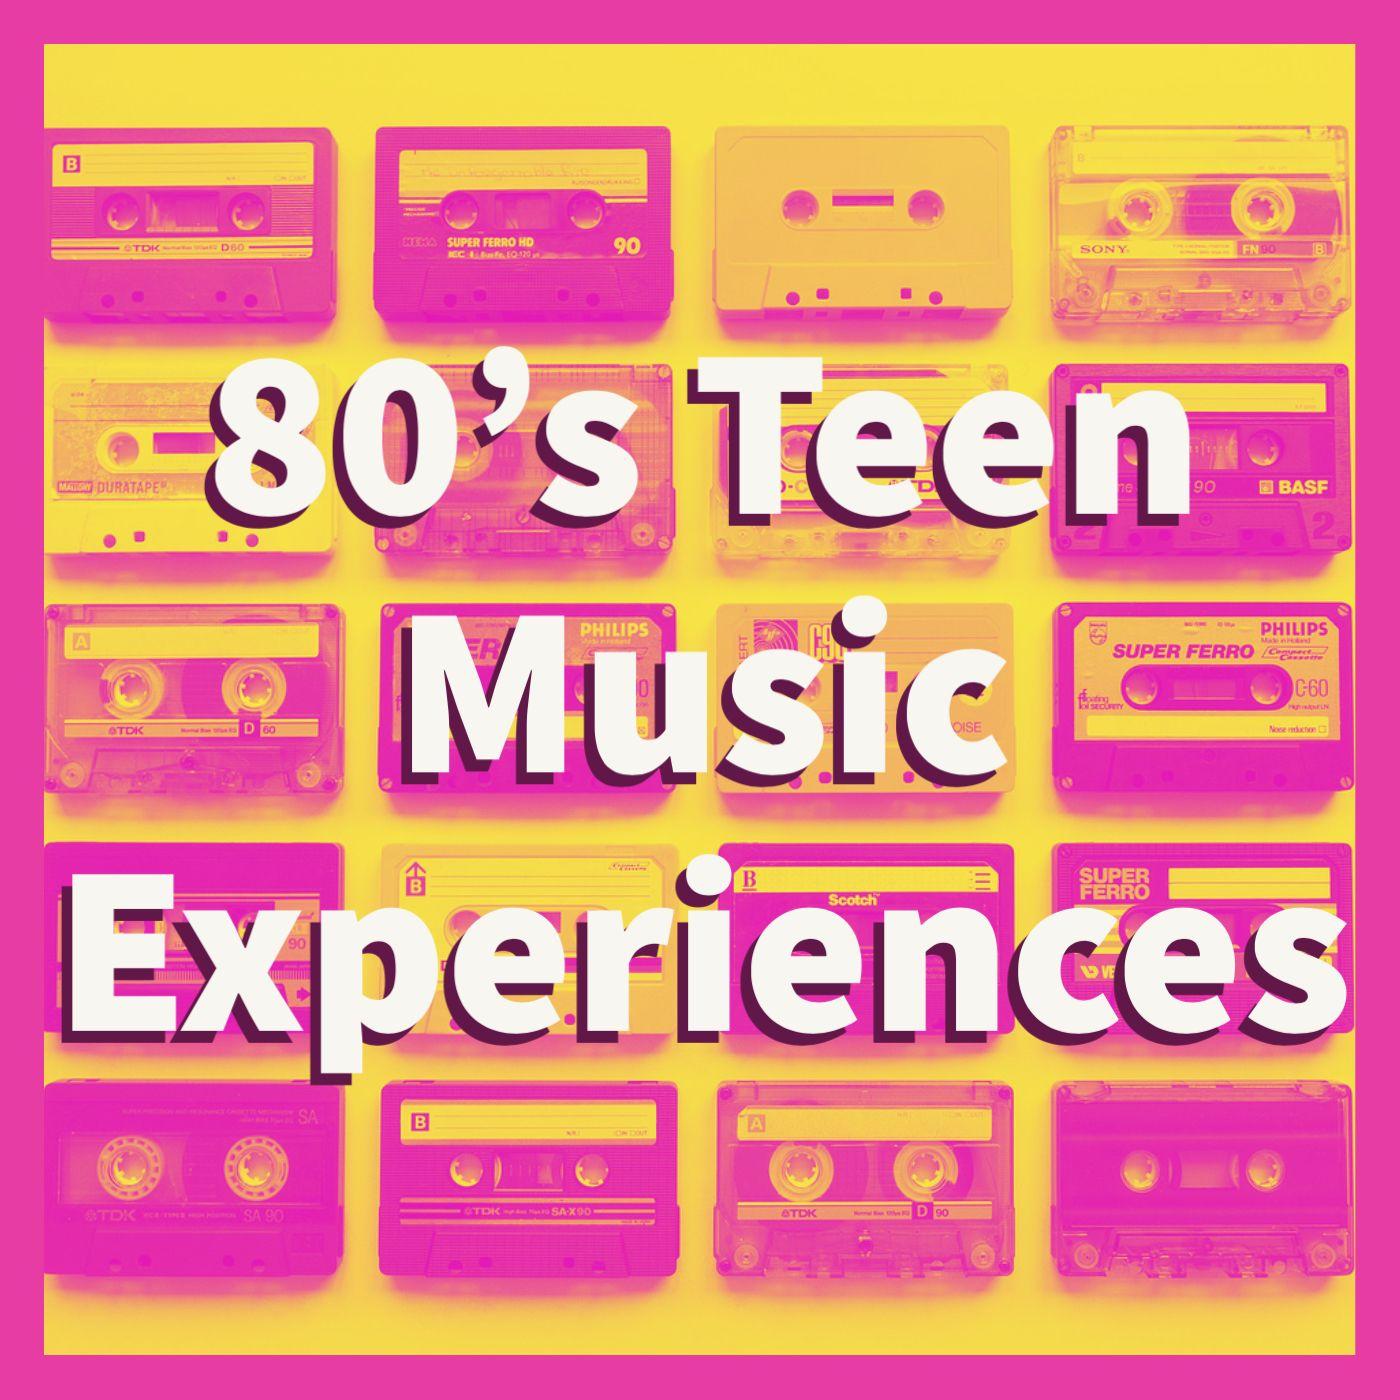 80's Teen Music Experiences